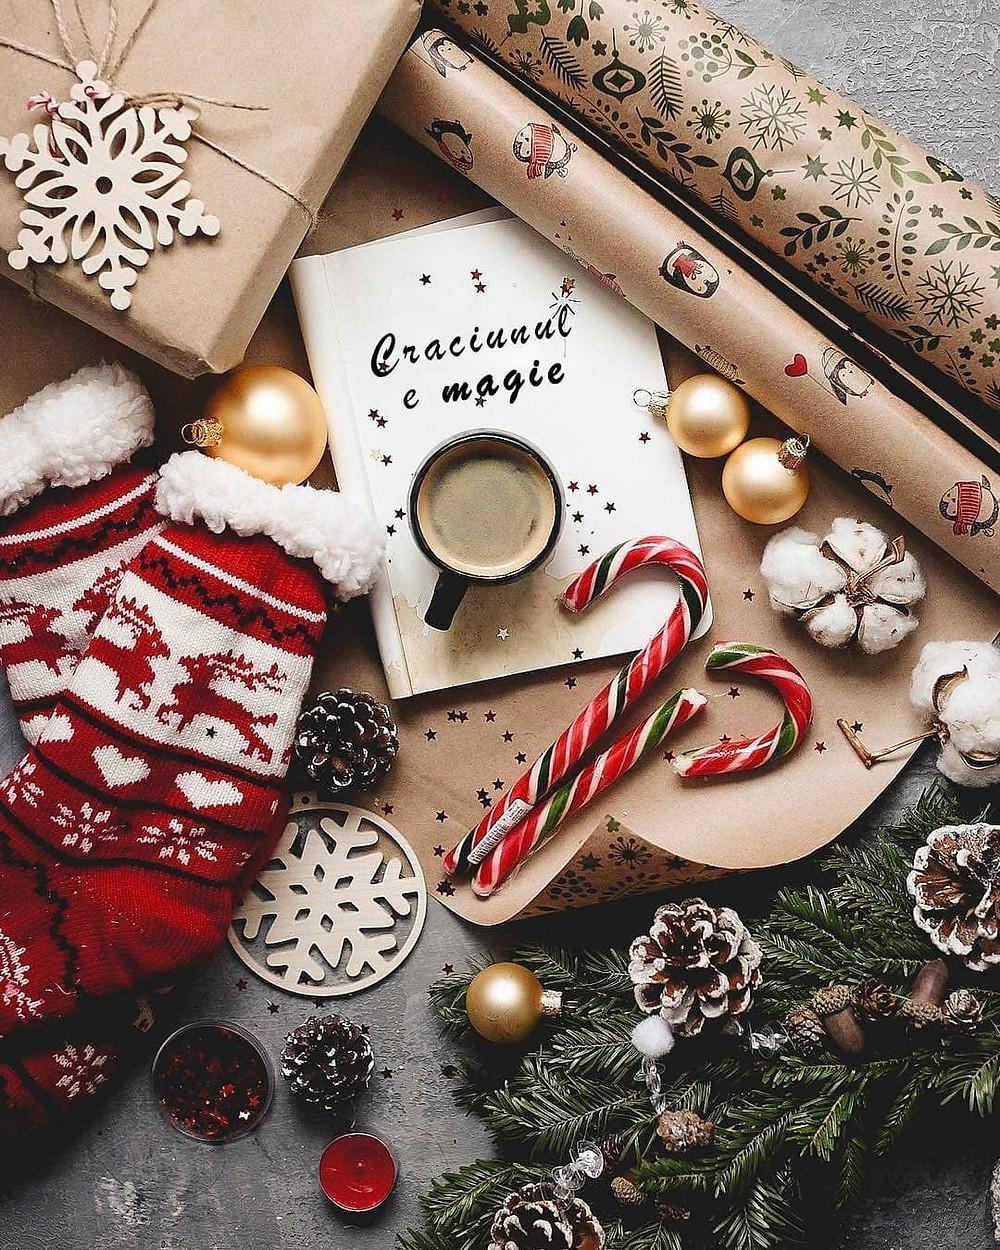 2018 Holiday Gift Guide - Cassandra Ann - 2018 Popular Blogger